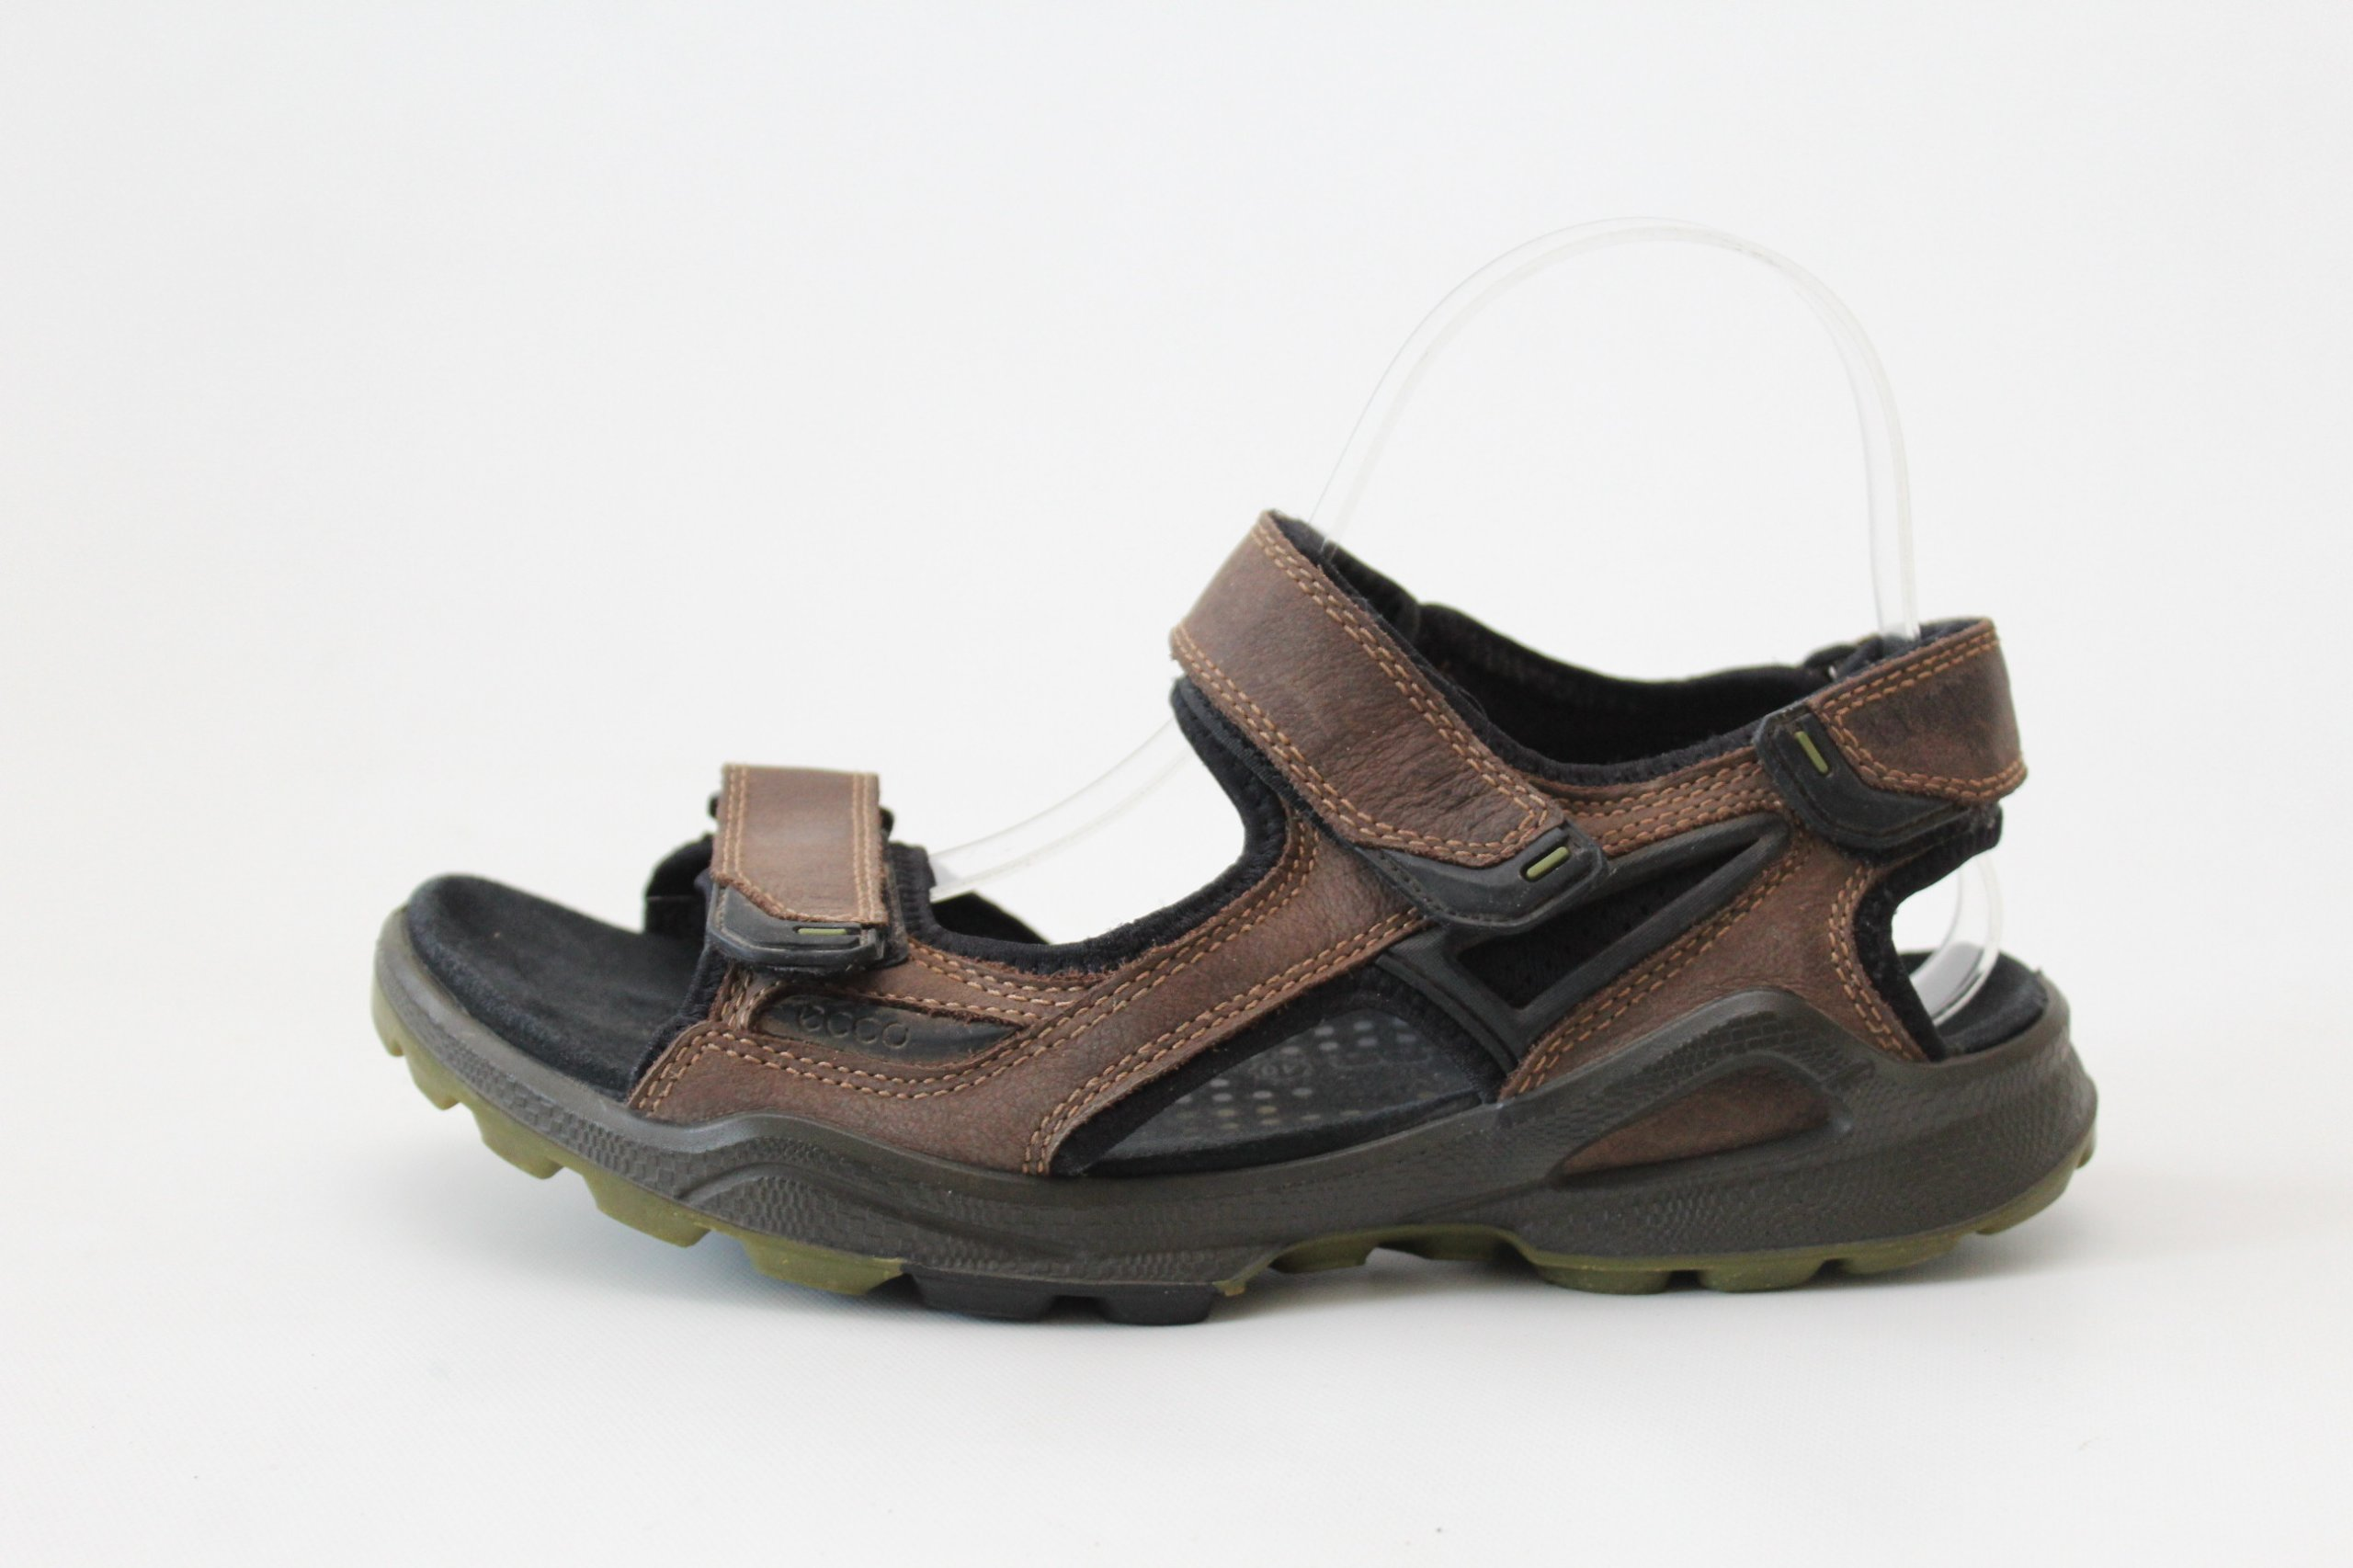 df43537b ECCO BIOM - skórzane sandały r. 40 (25,5 cm) - 7388313098 ...